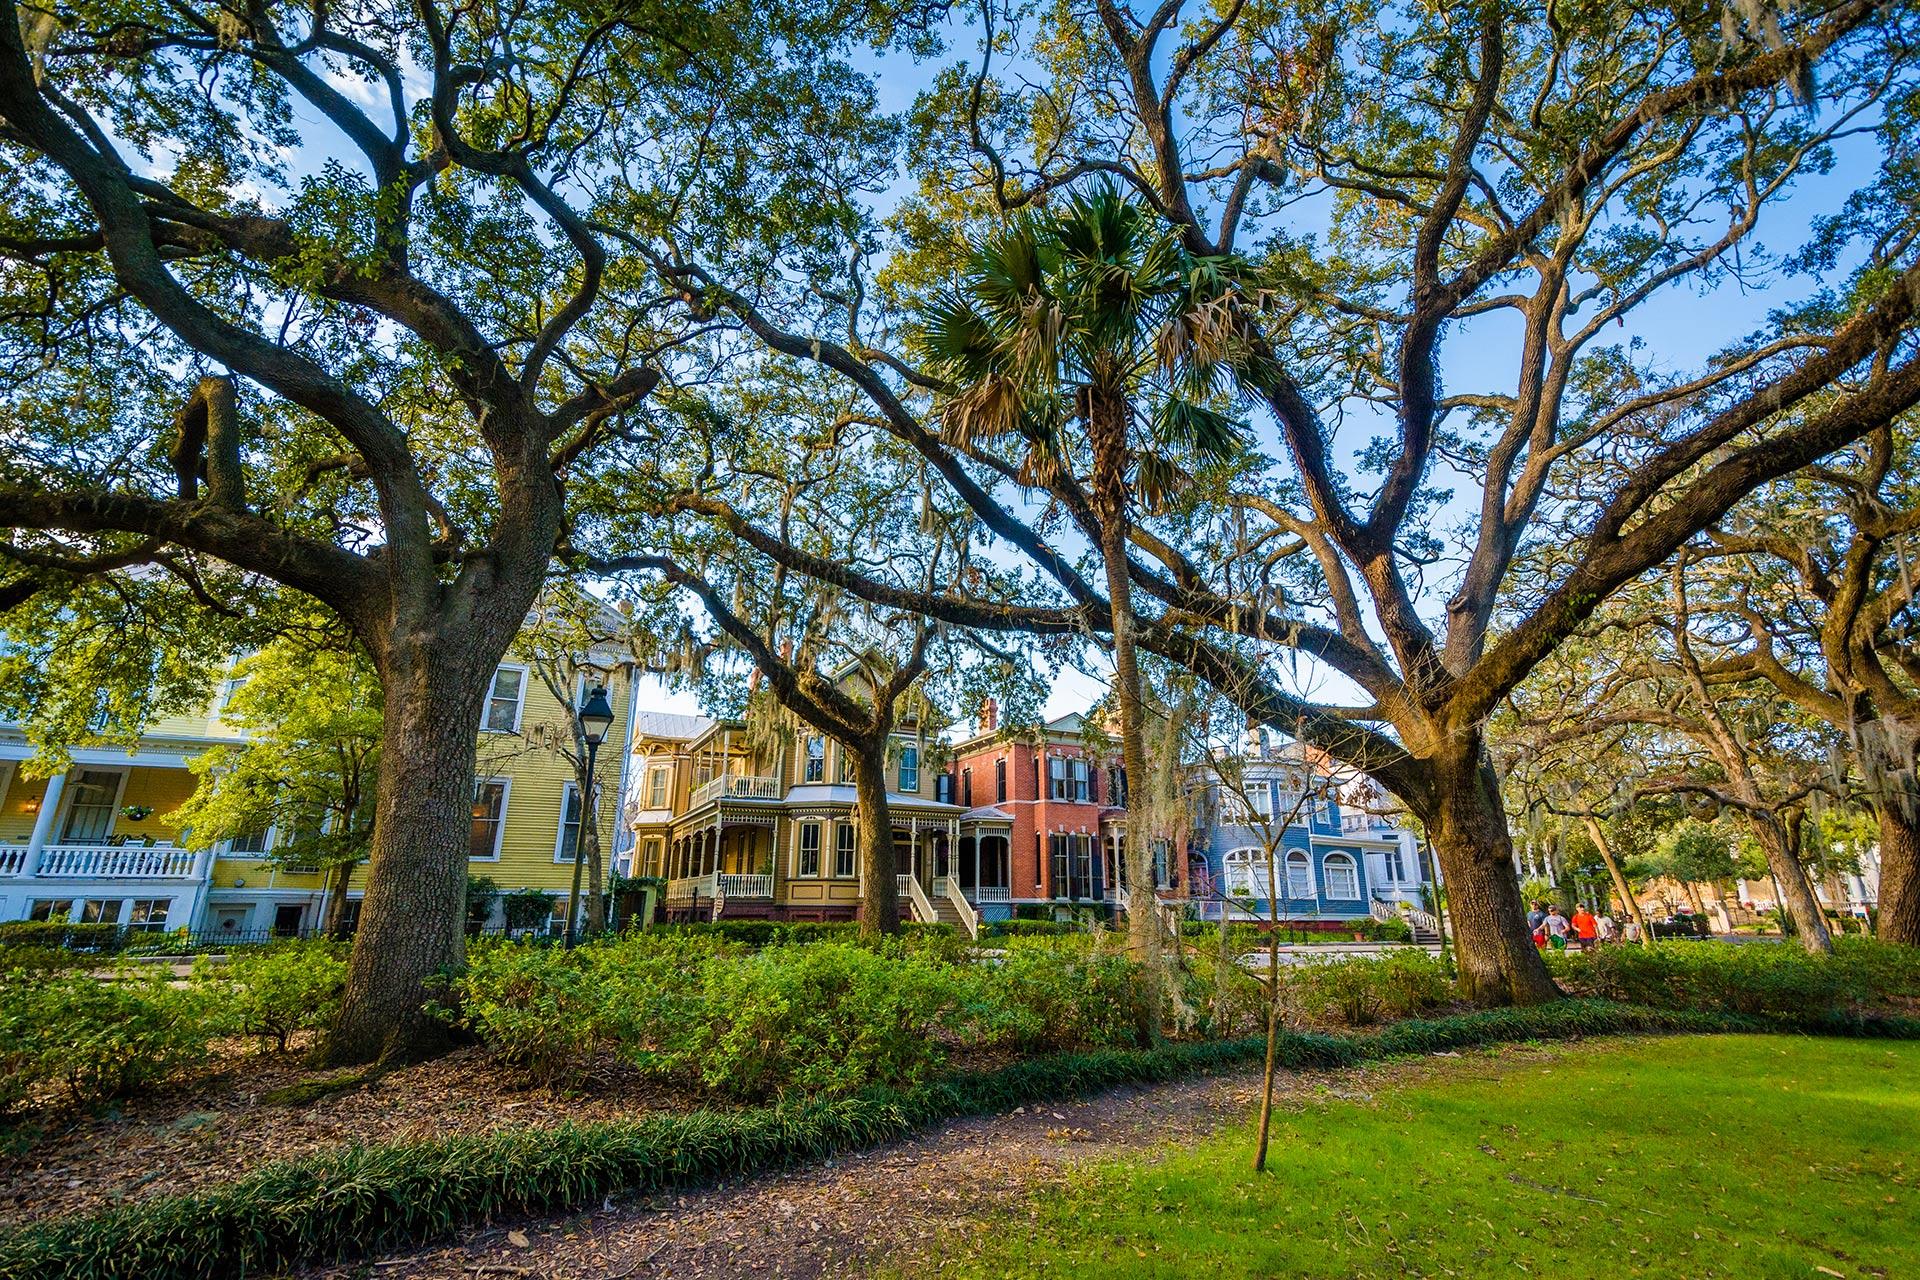 Savannah, Georgia; Photo Courtesy of Jon Bilous/Shutterstock.com